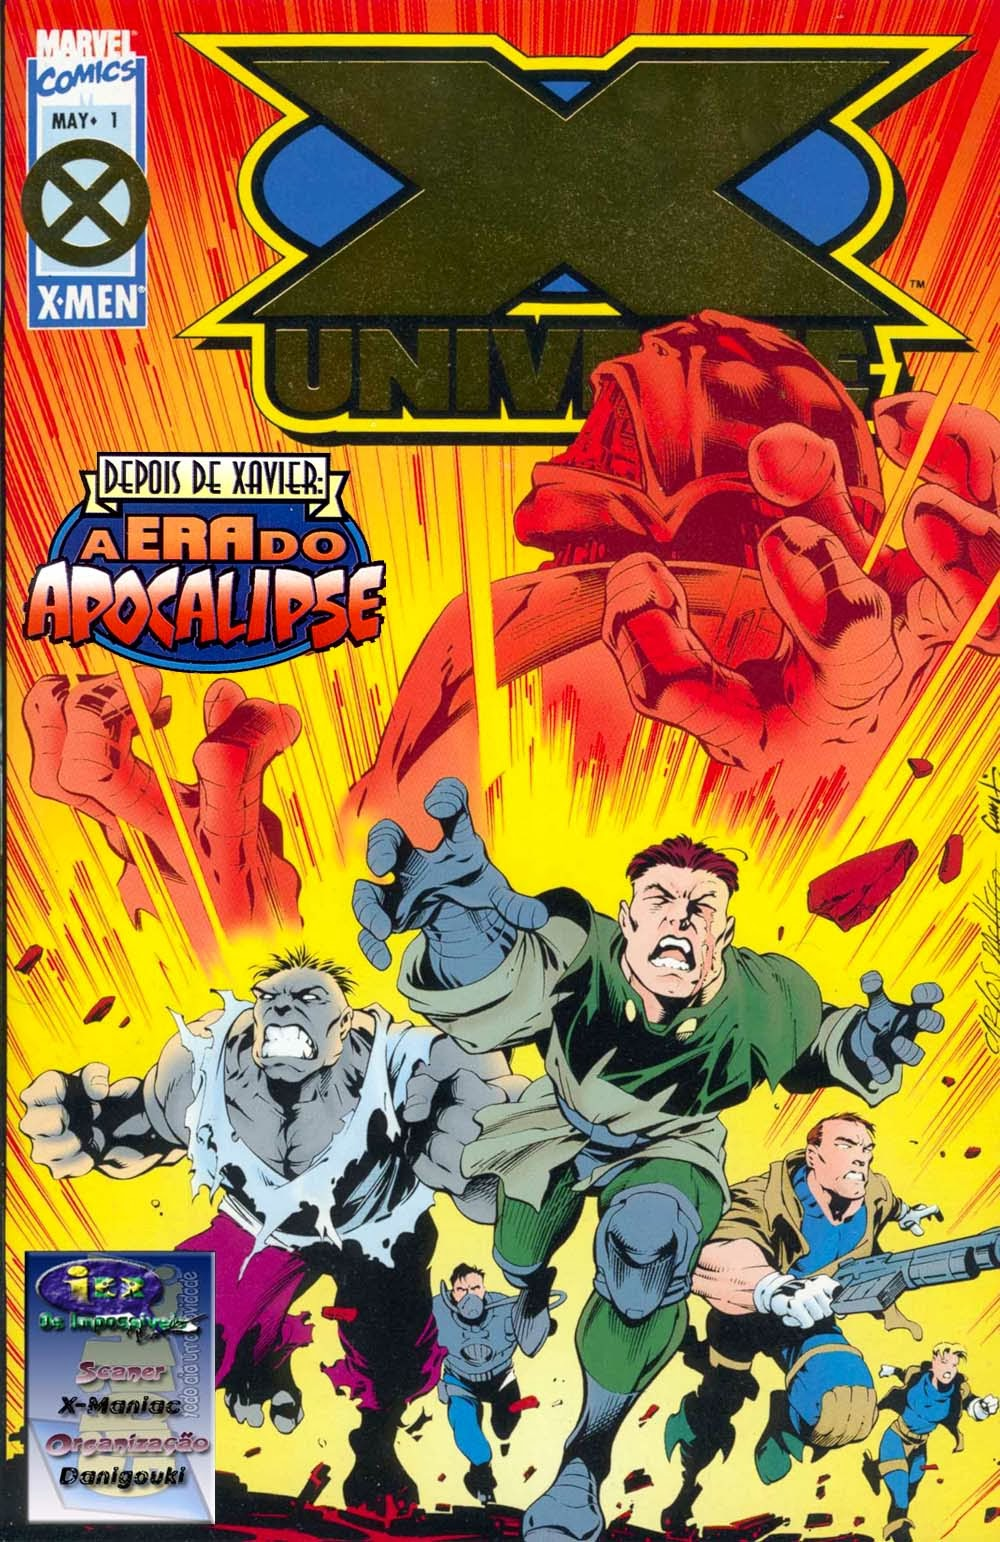 X-Men - A Era do Apocalipse #35